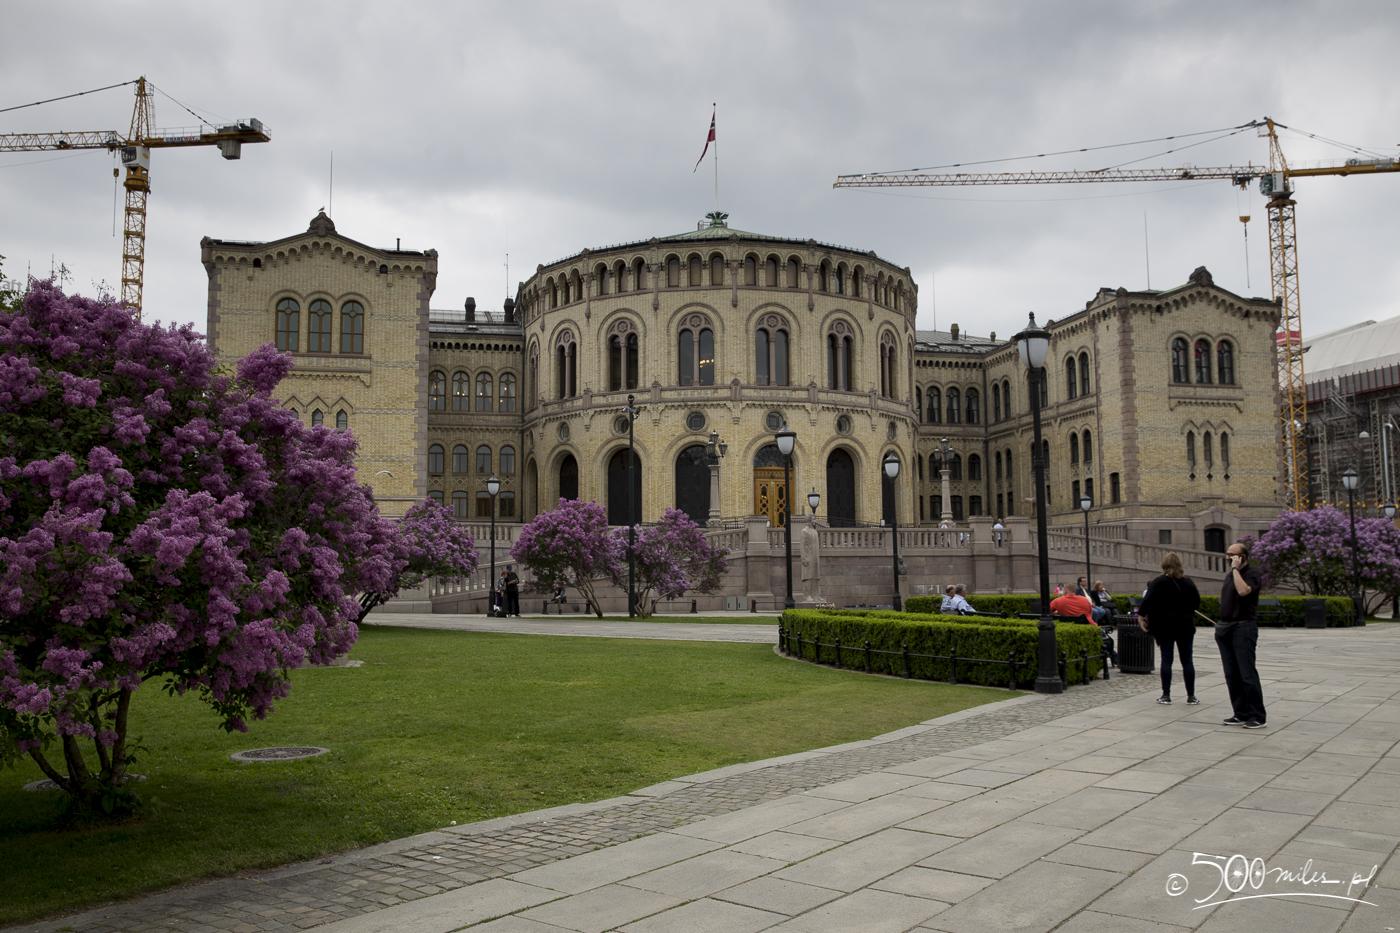 Oslo - Stortinget (Parliament)